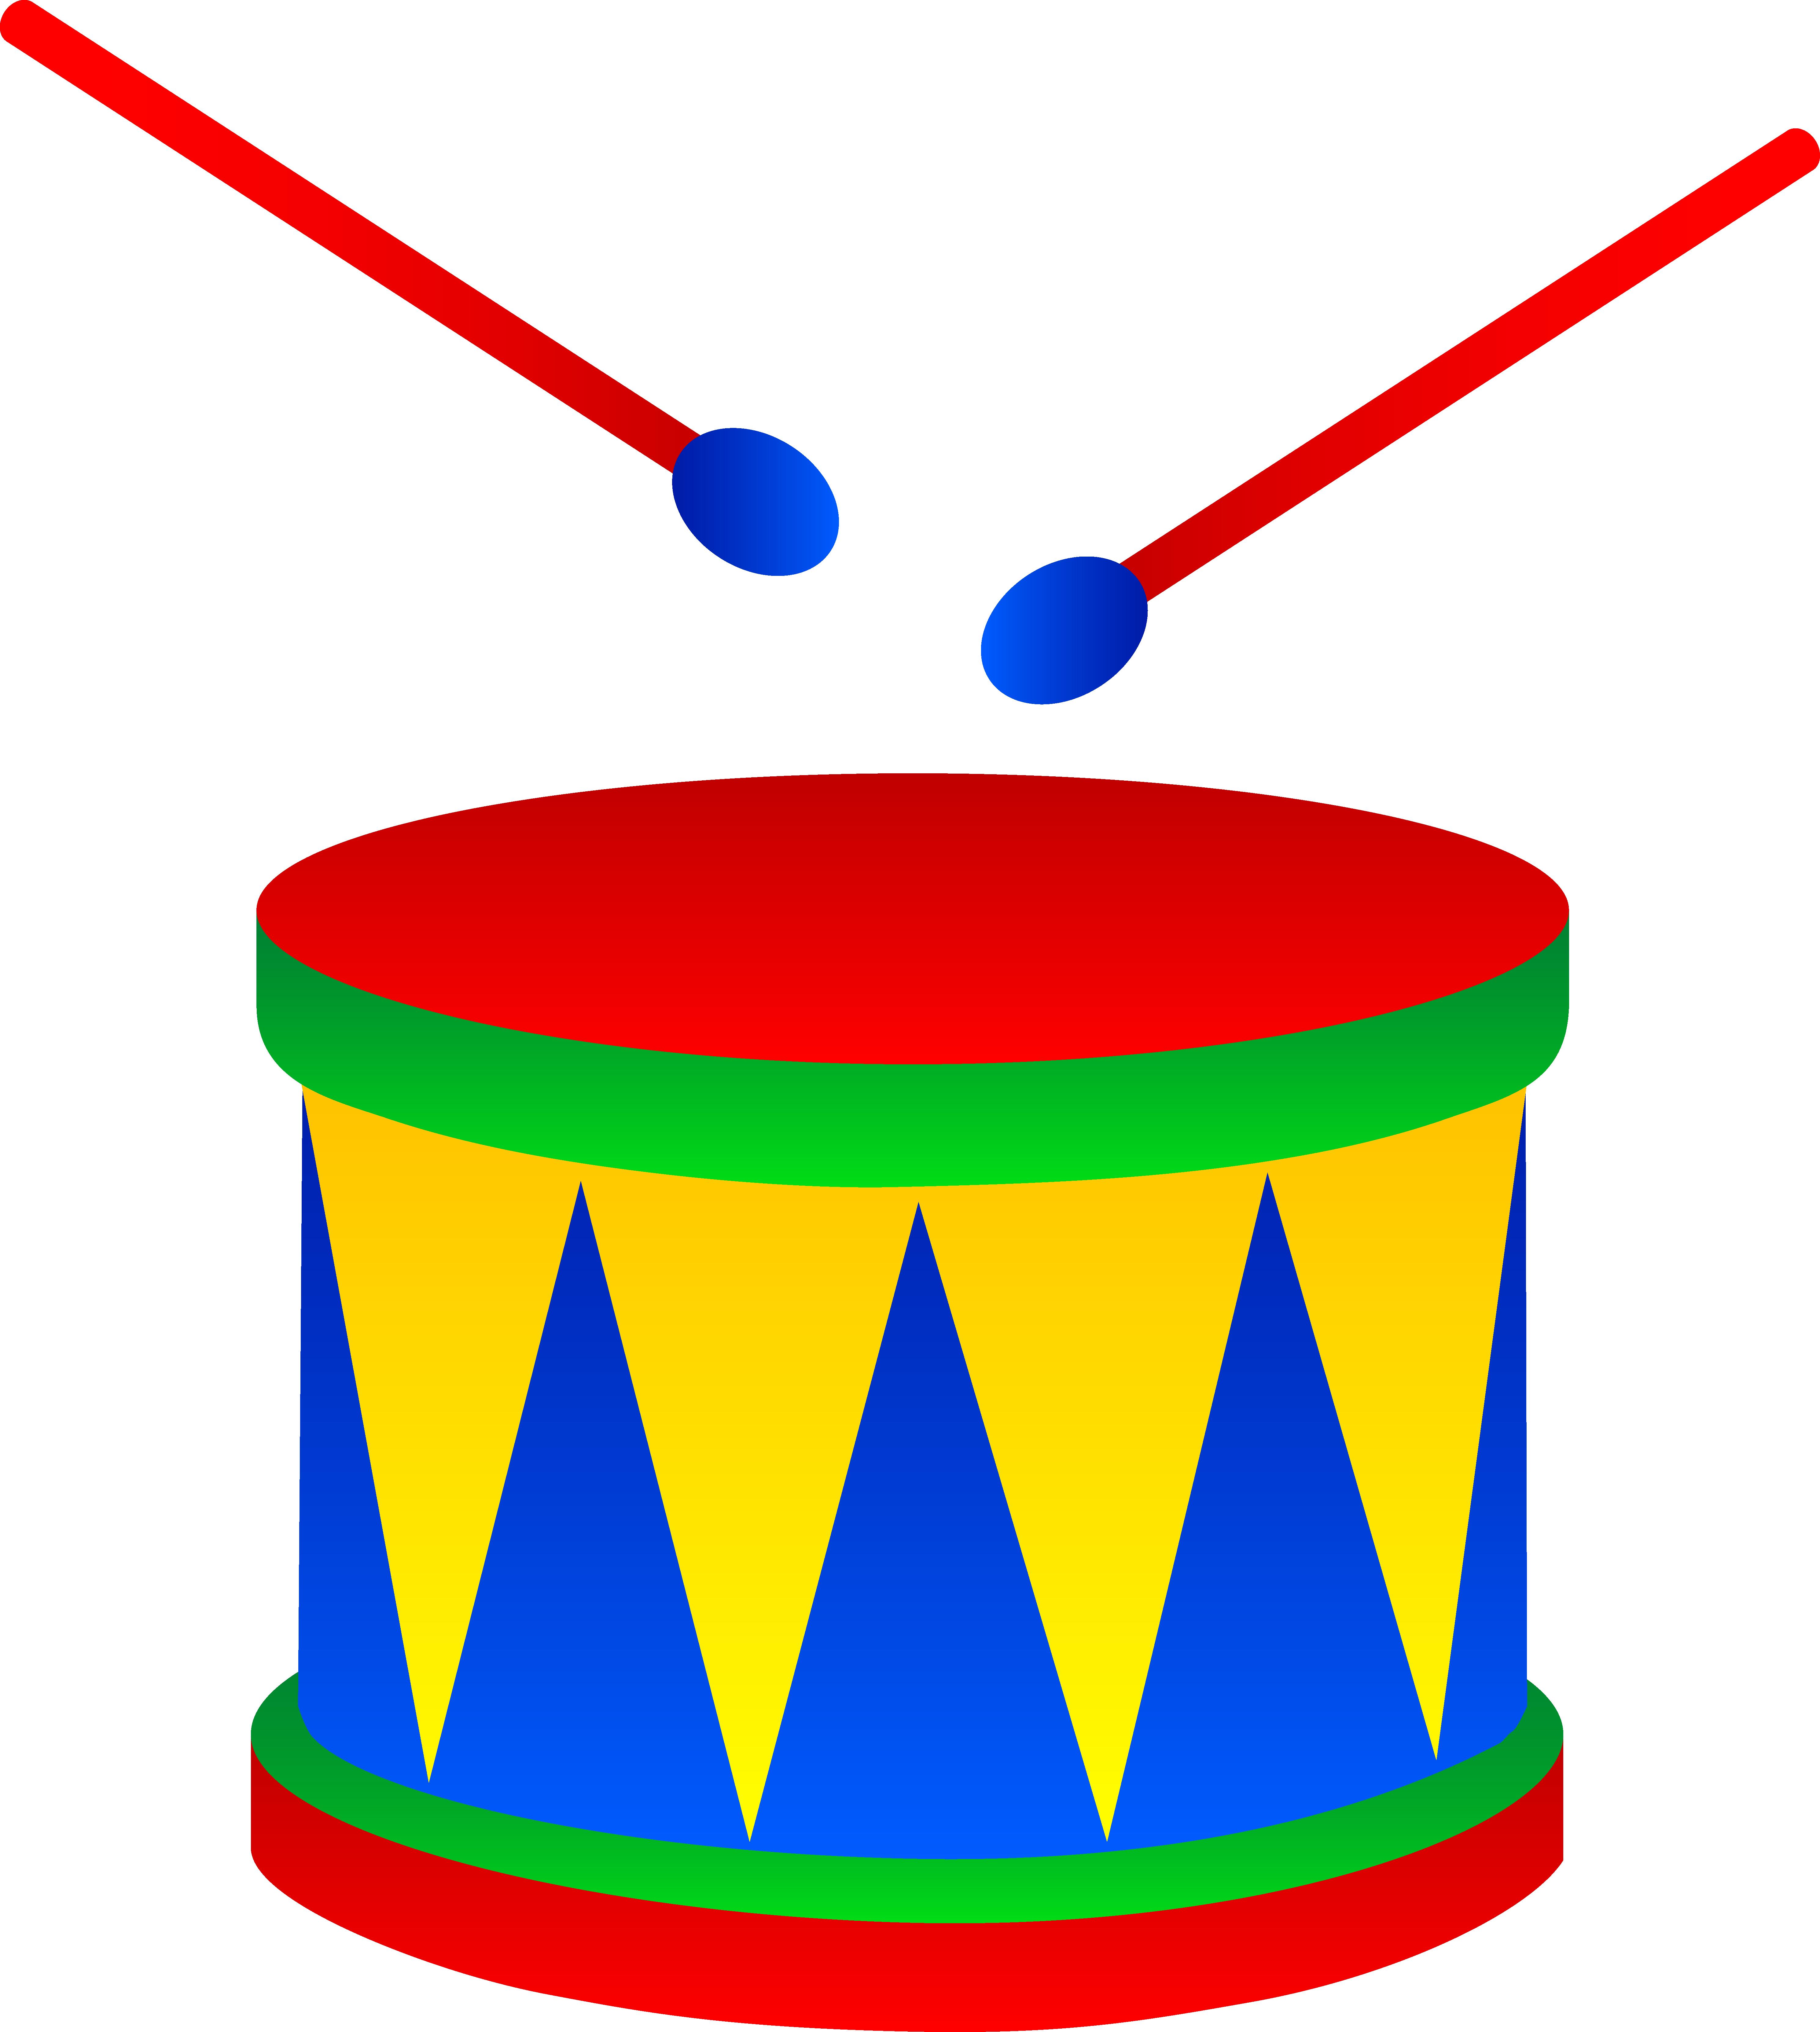 svg transparent library Drum clip art free. Drums clipart.